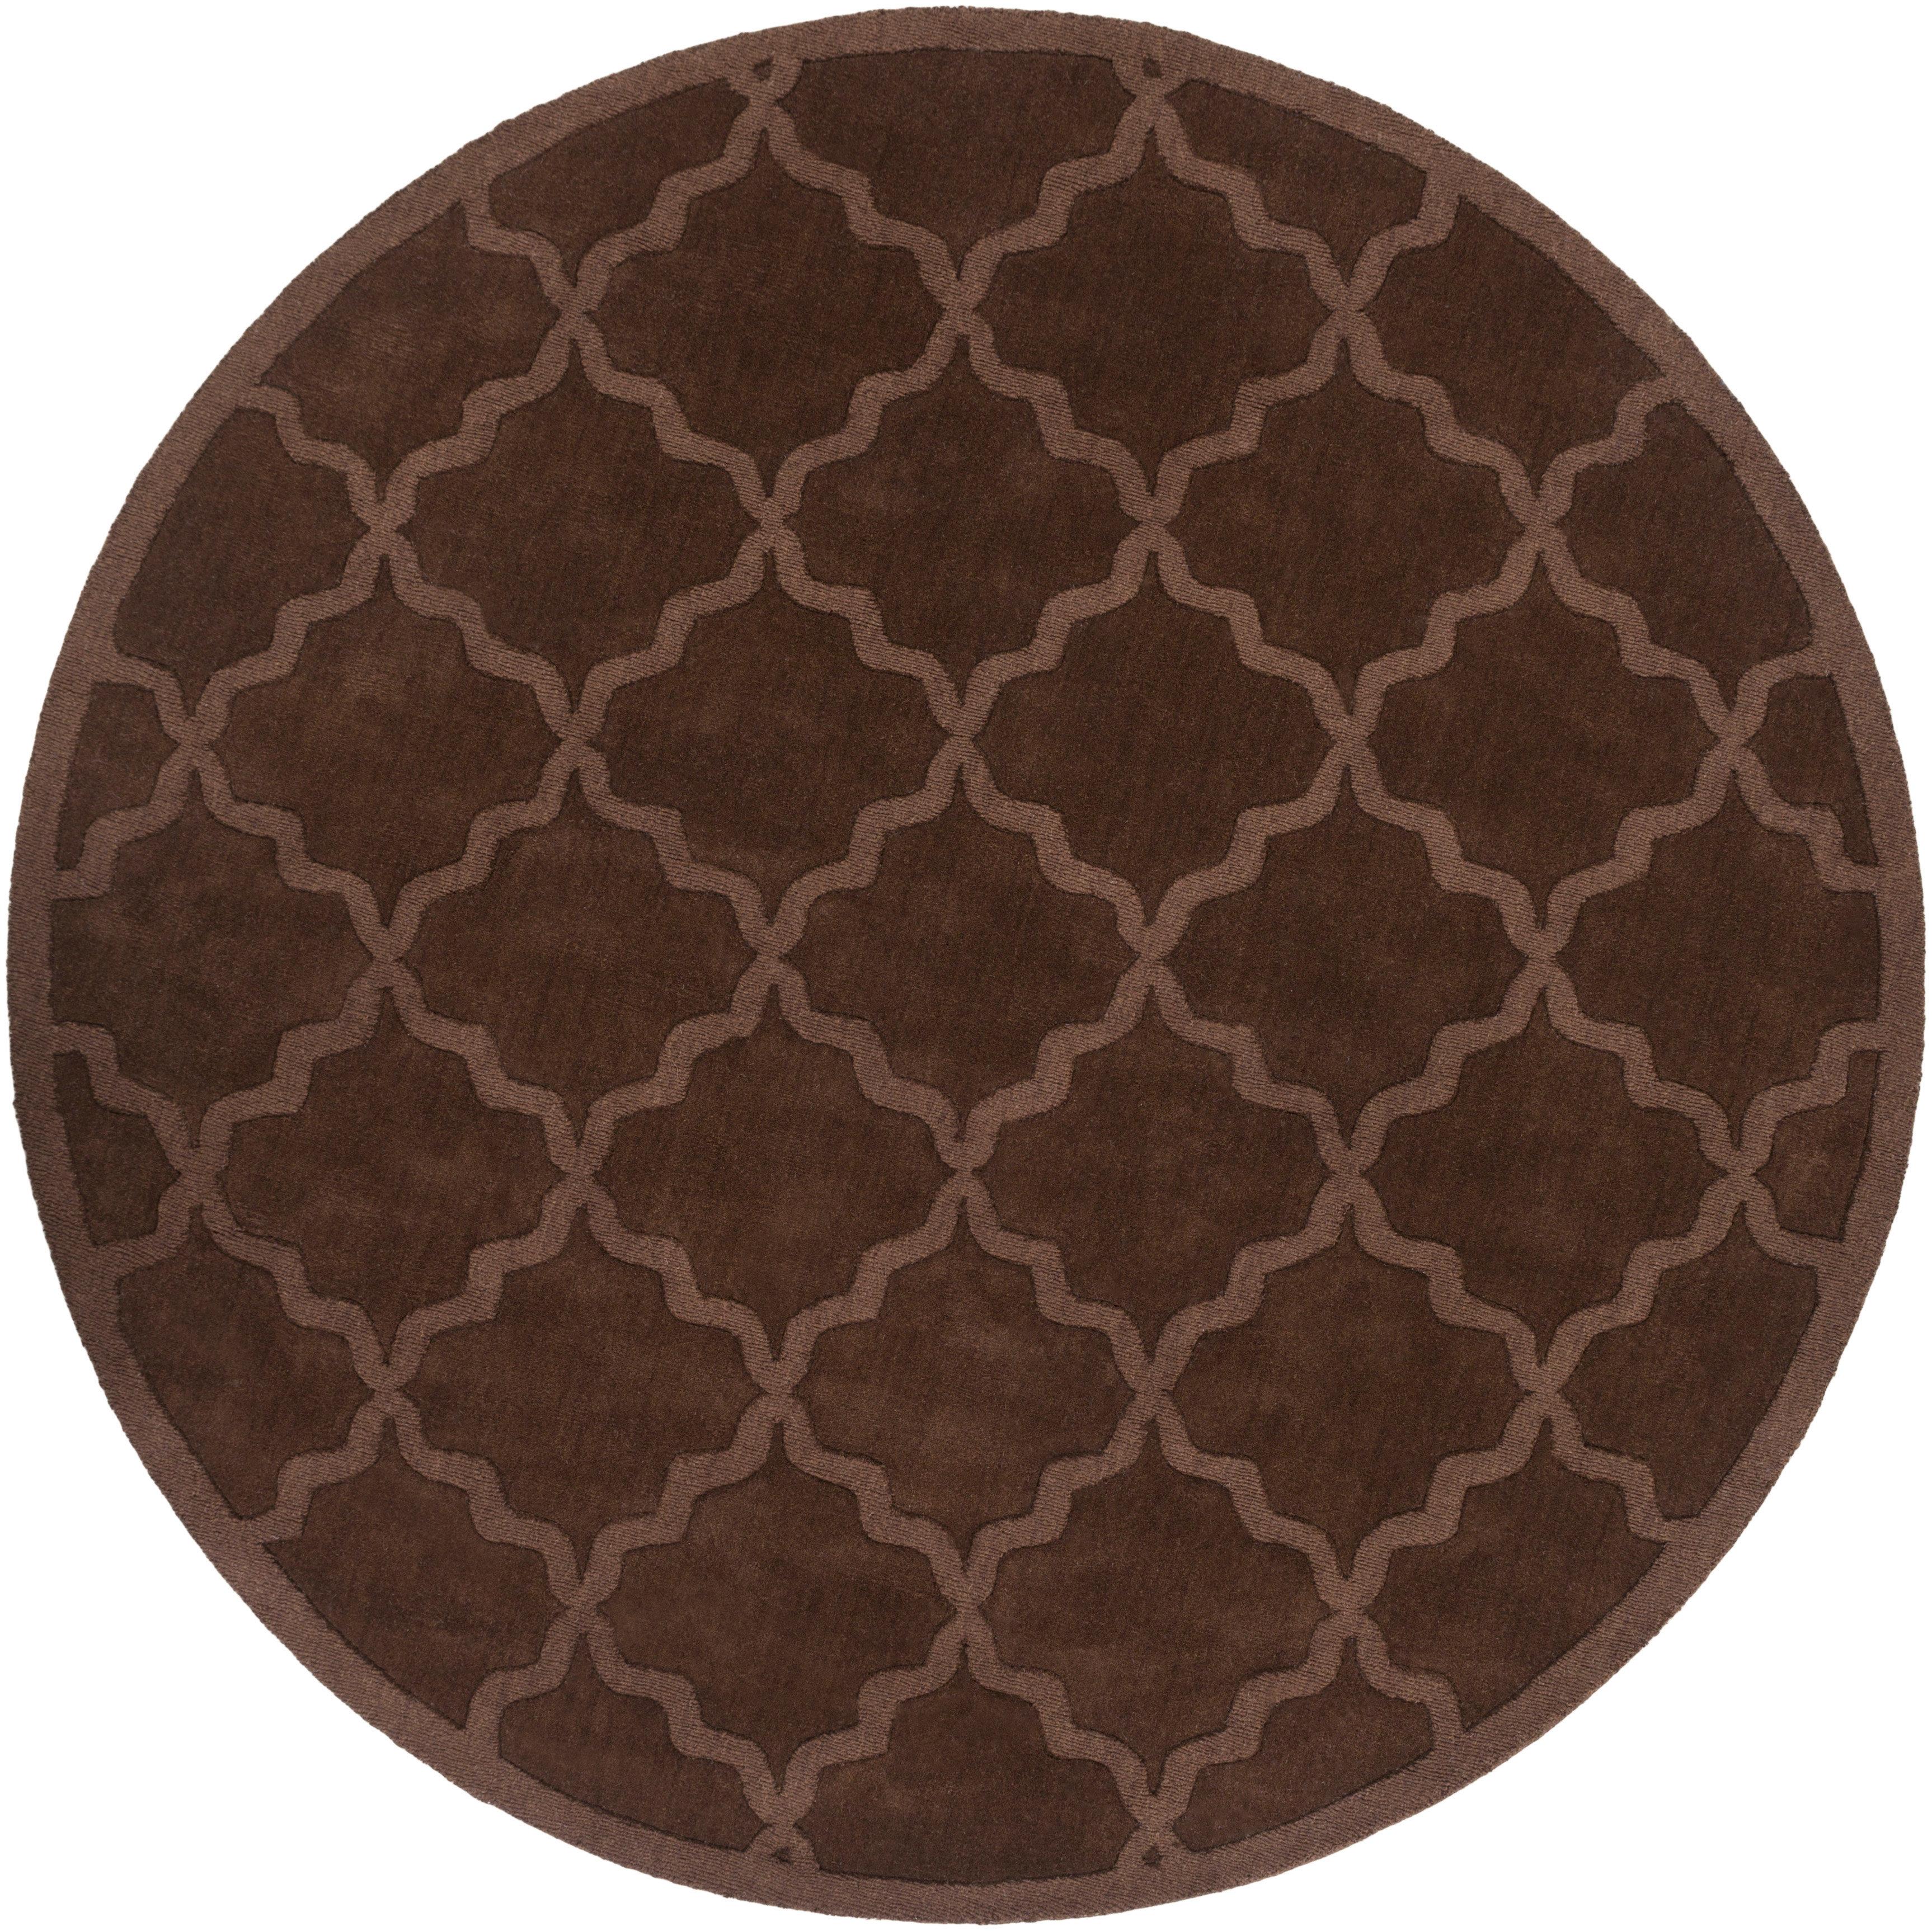 Handmade Wool Chocolate Brown